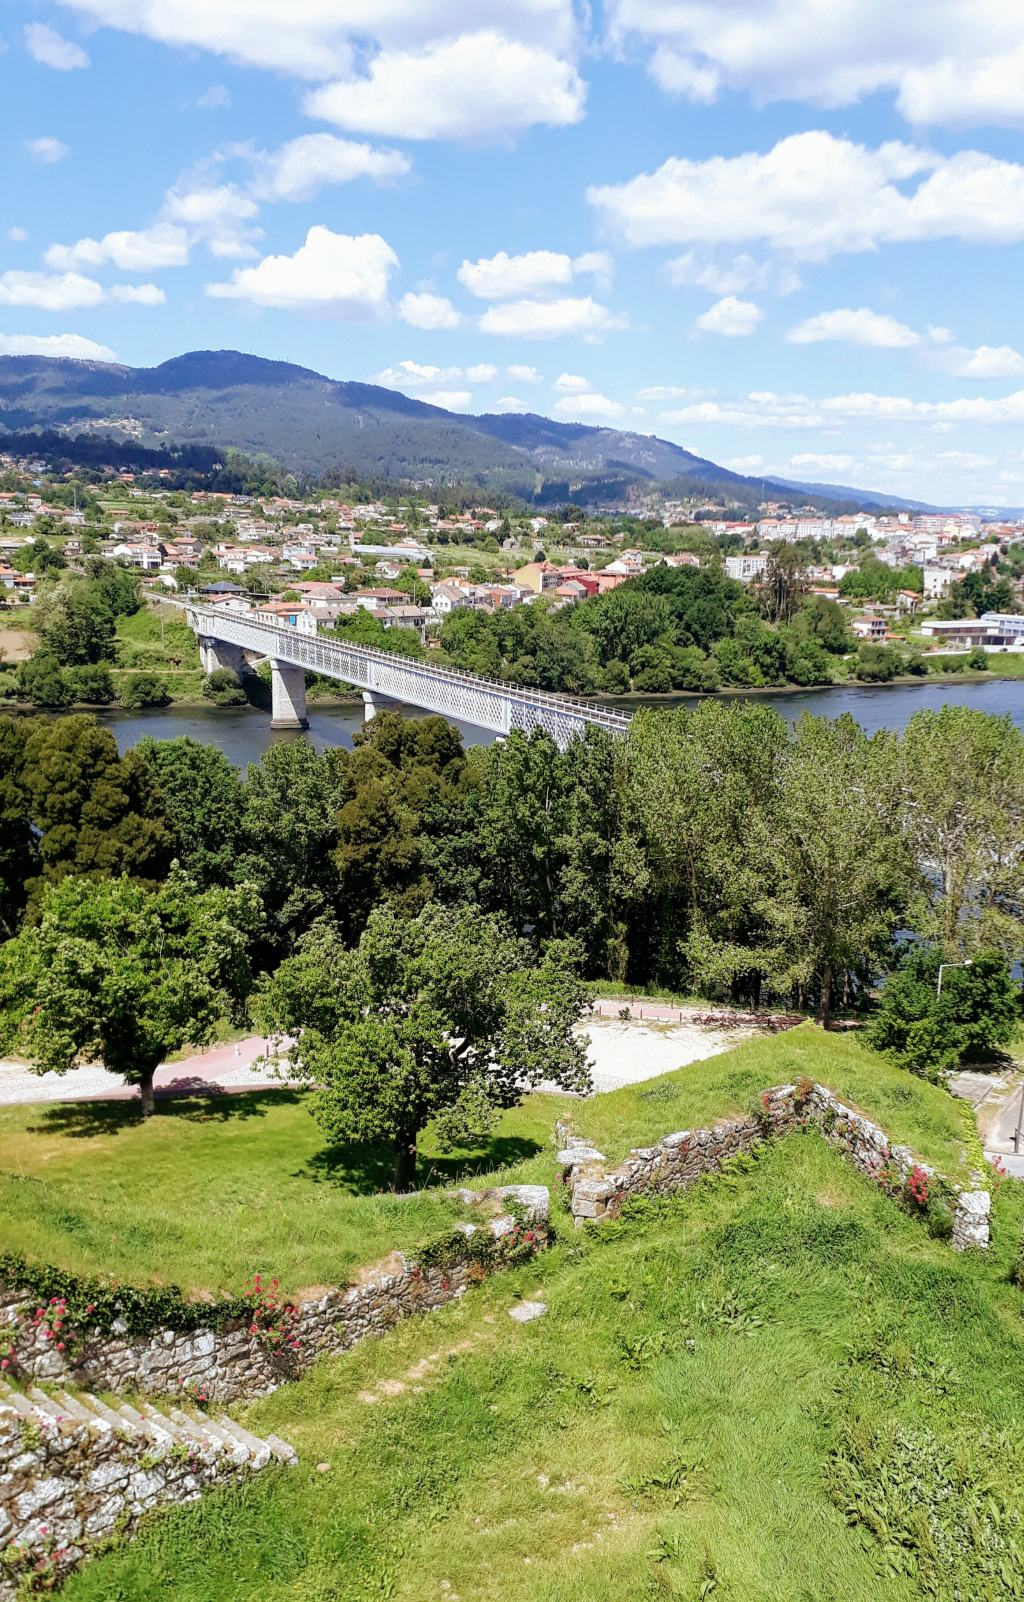 Blick auf die Ponte Internacional von Valença